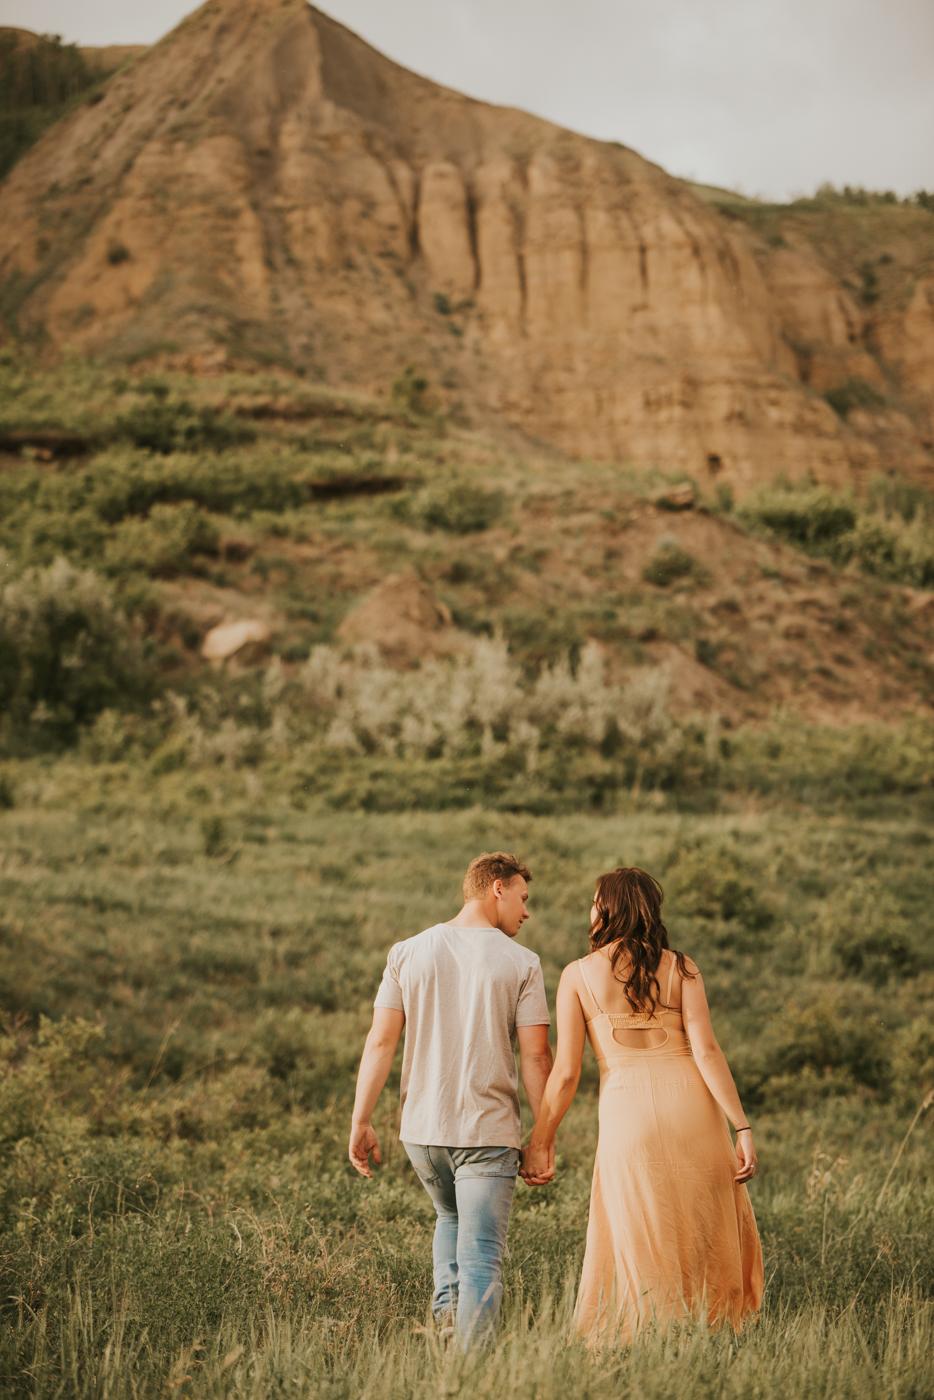 tyraephotography_photographer_wedding_elopement_engagement_photography-2-4.jpg